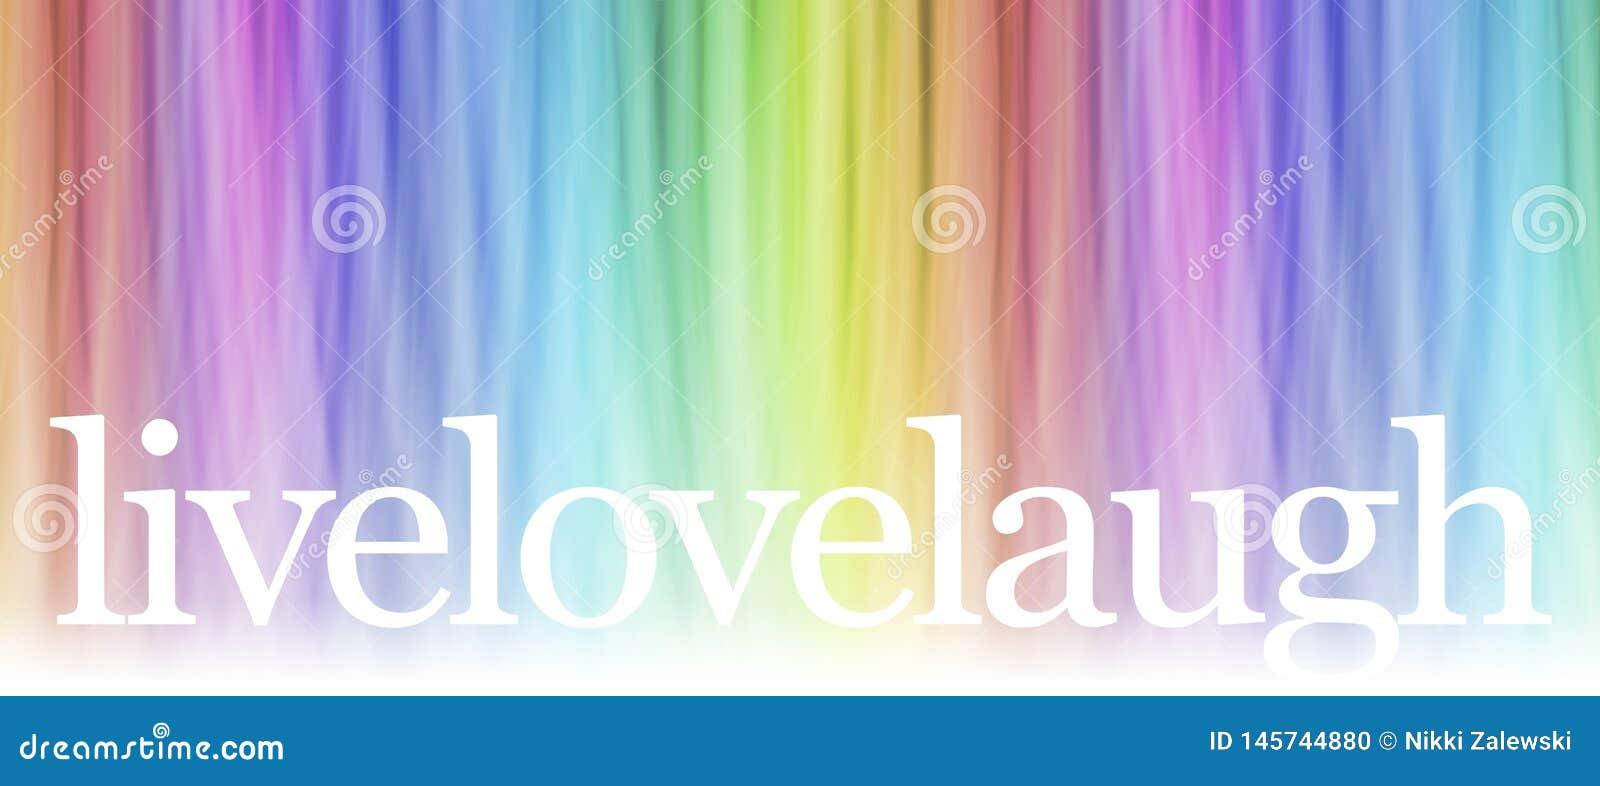 Live Laugh Love Message Banner